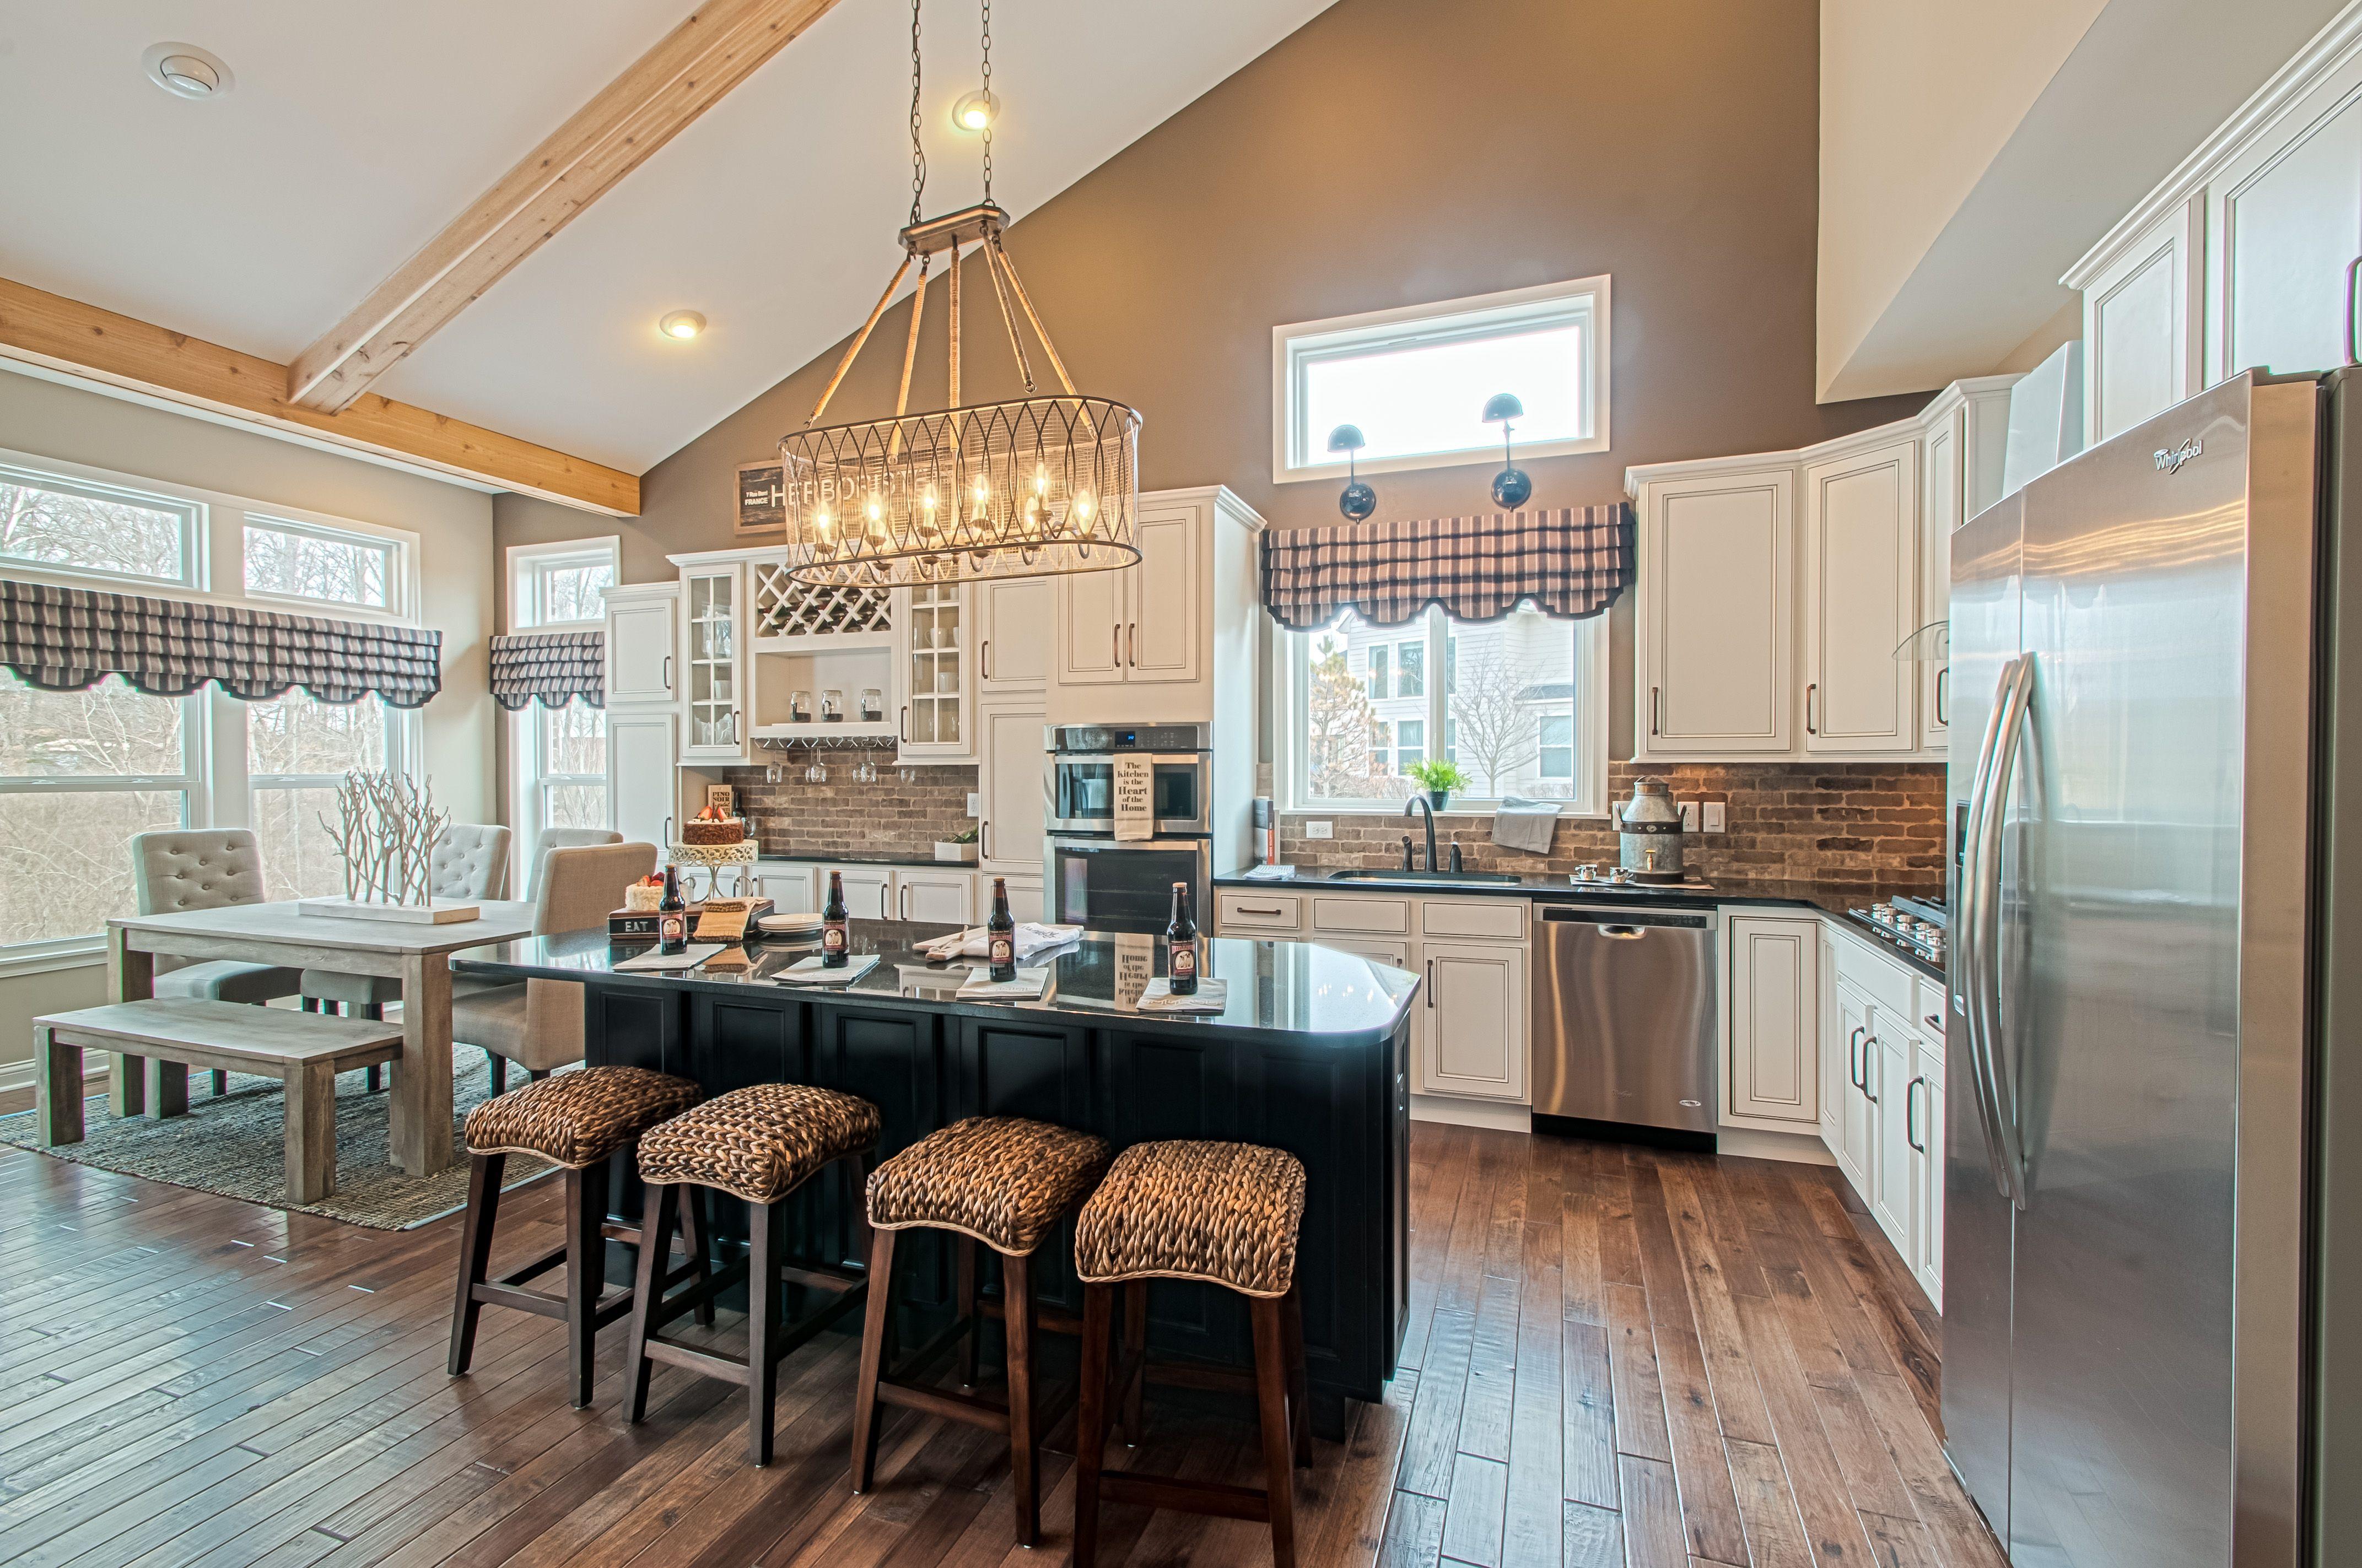 Kitchen featured in the Blake By Fischer Homes  in Cincinnati, KY